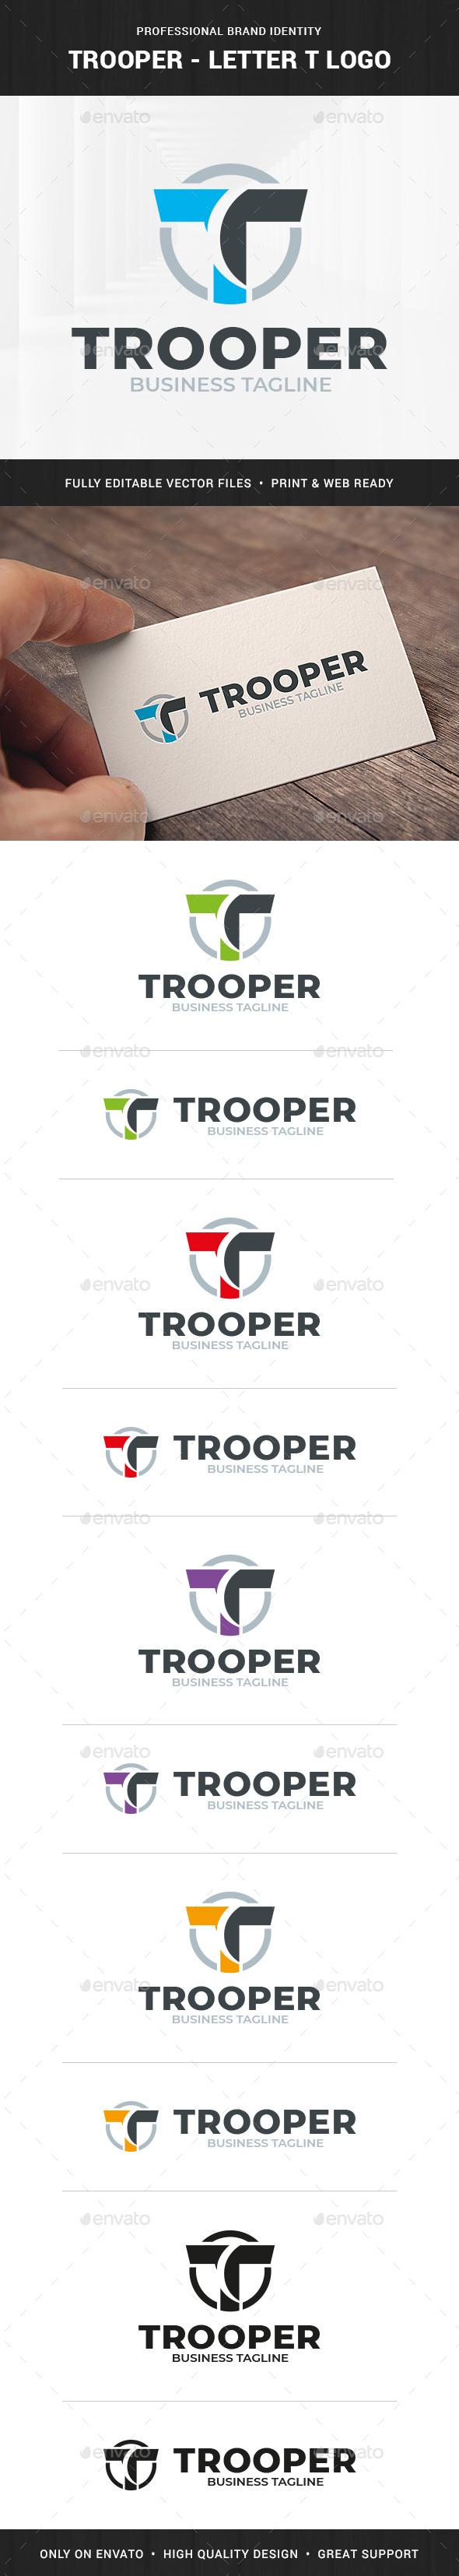 Trooper - Letter T Logo Template